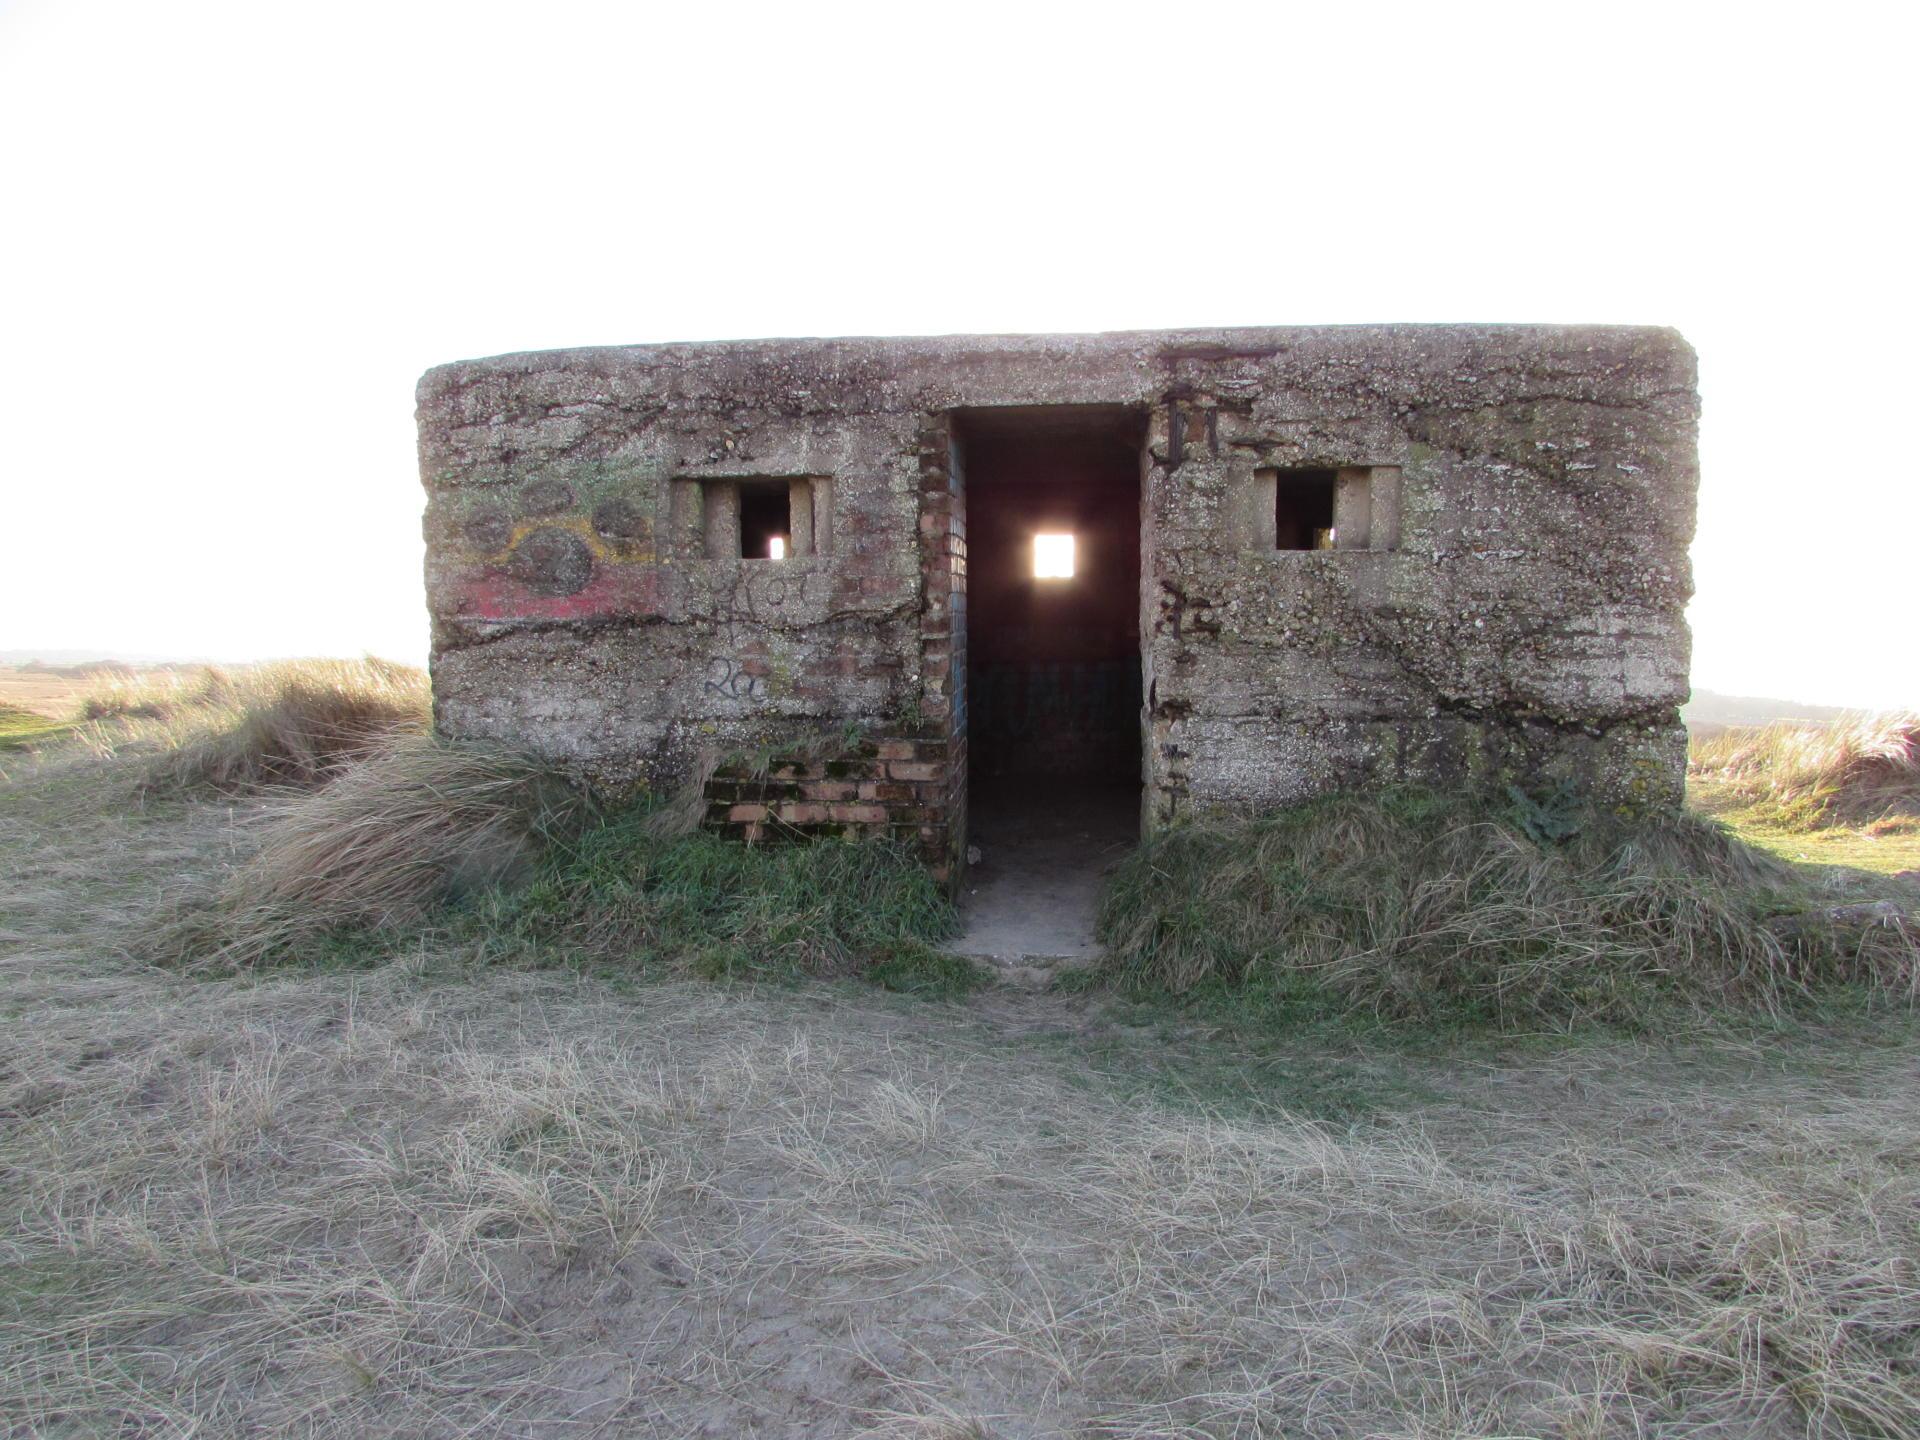 Seal Watching in North Norfolk - Yesihaveablog   WW2 Pillbox Horsey Gap   Norfolk - Life in a Fine City   Winterlust